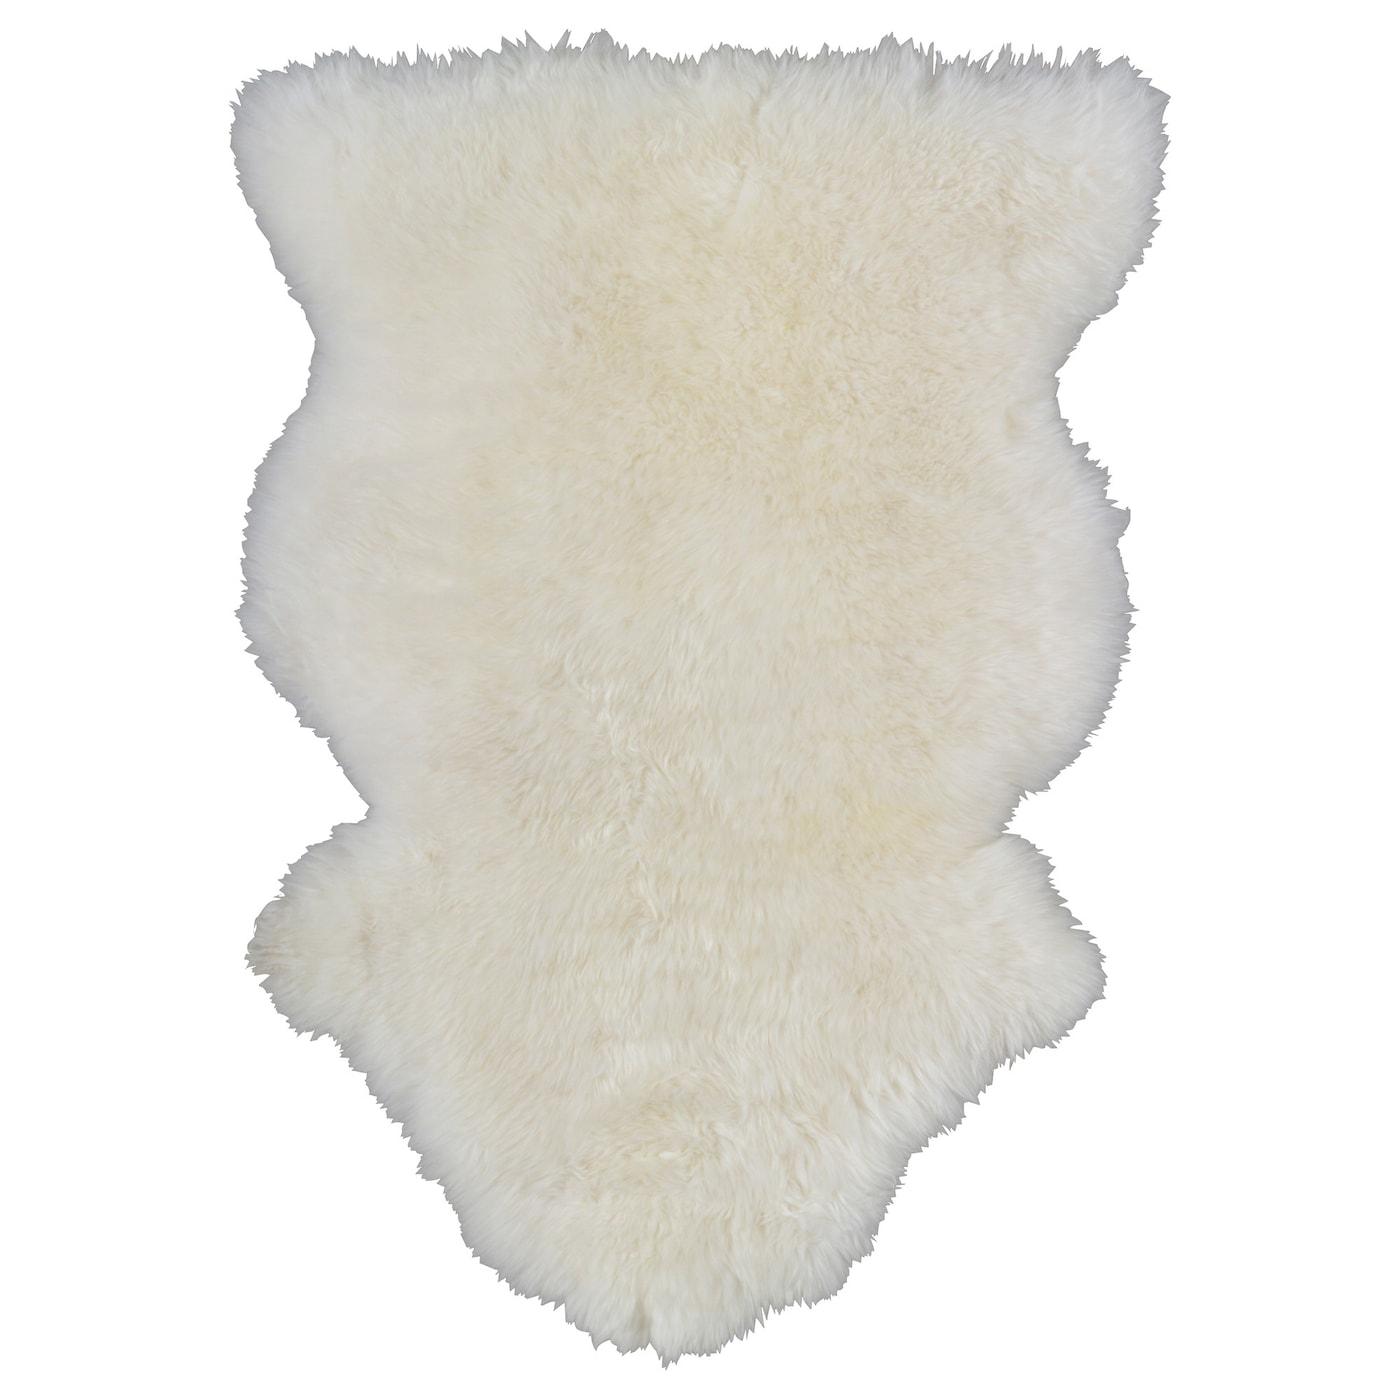 RENS Sheepskin white